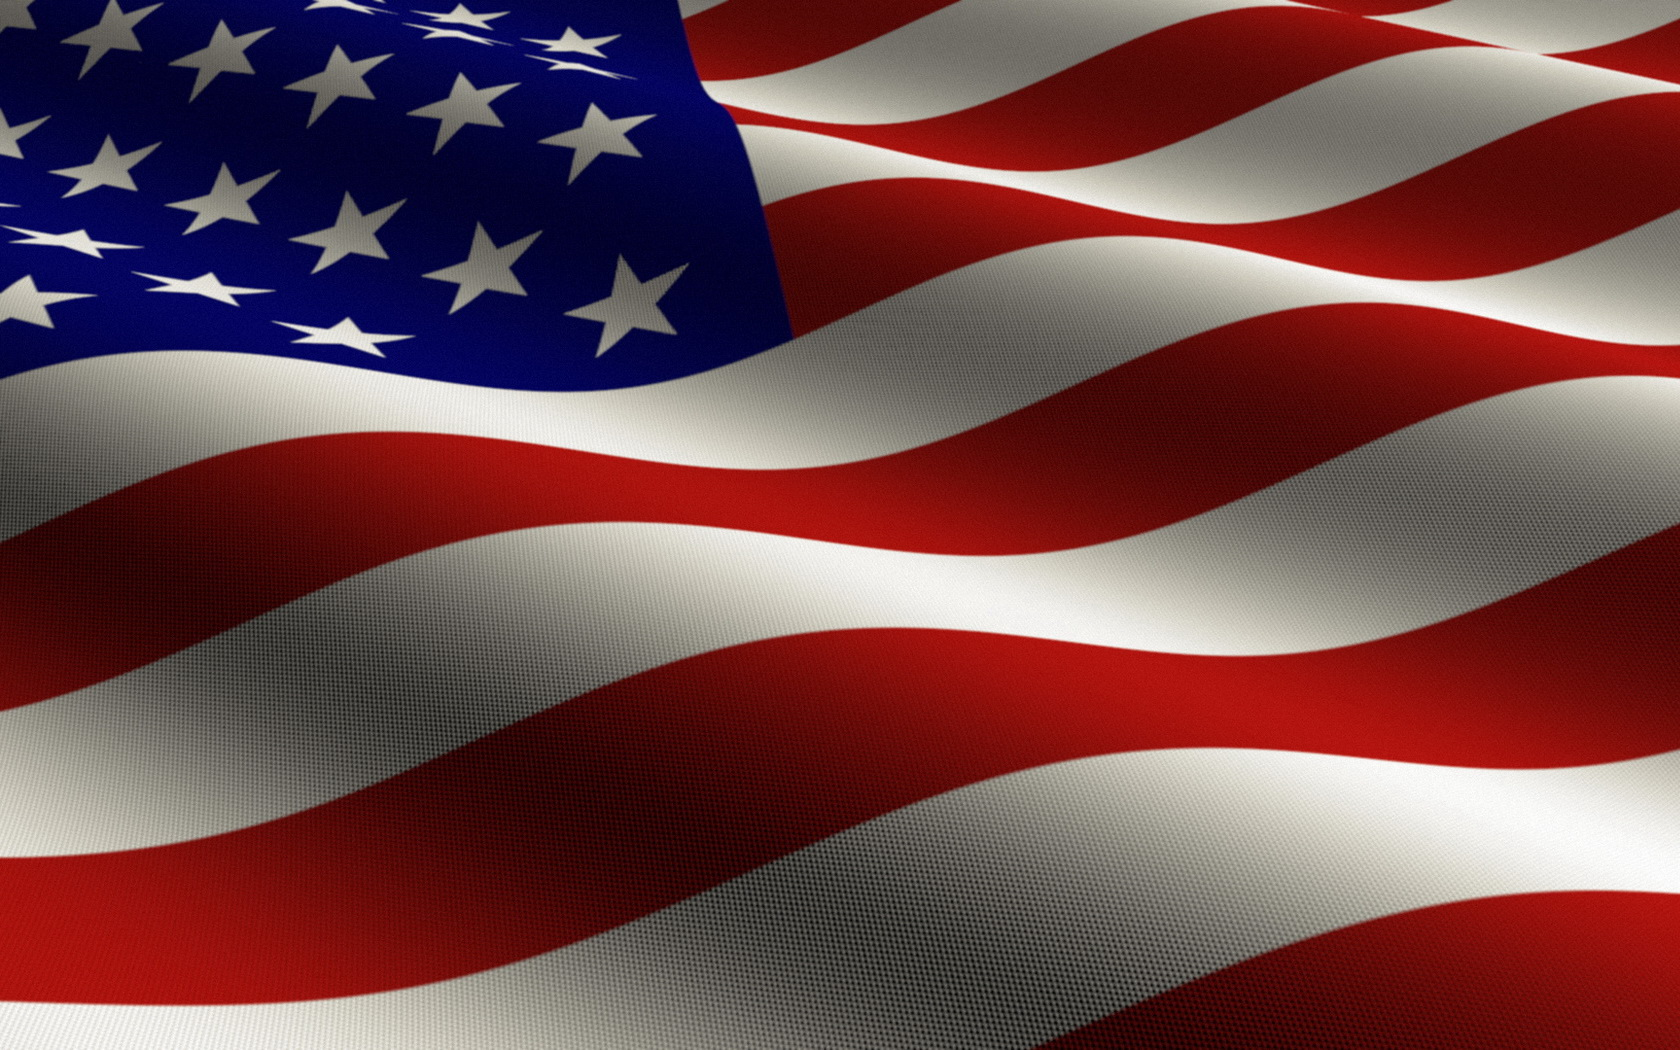 usa american flag wallpaper 1680x1050 152556 wallpaperup